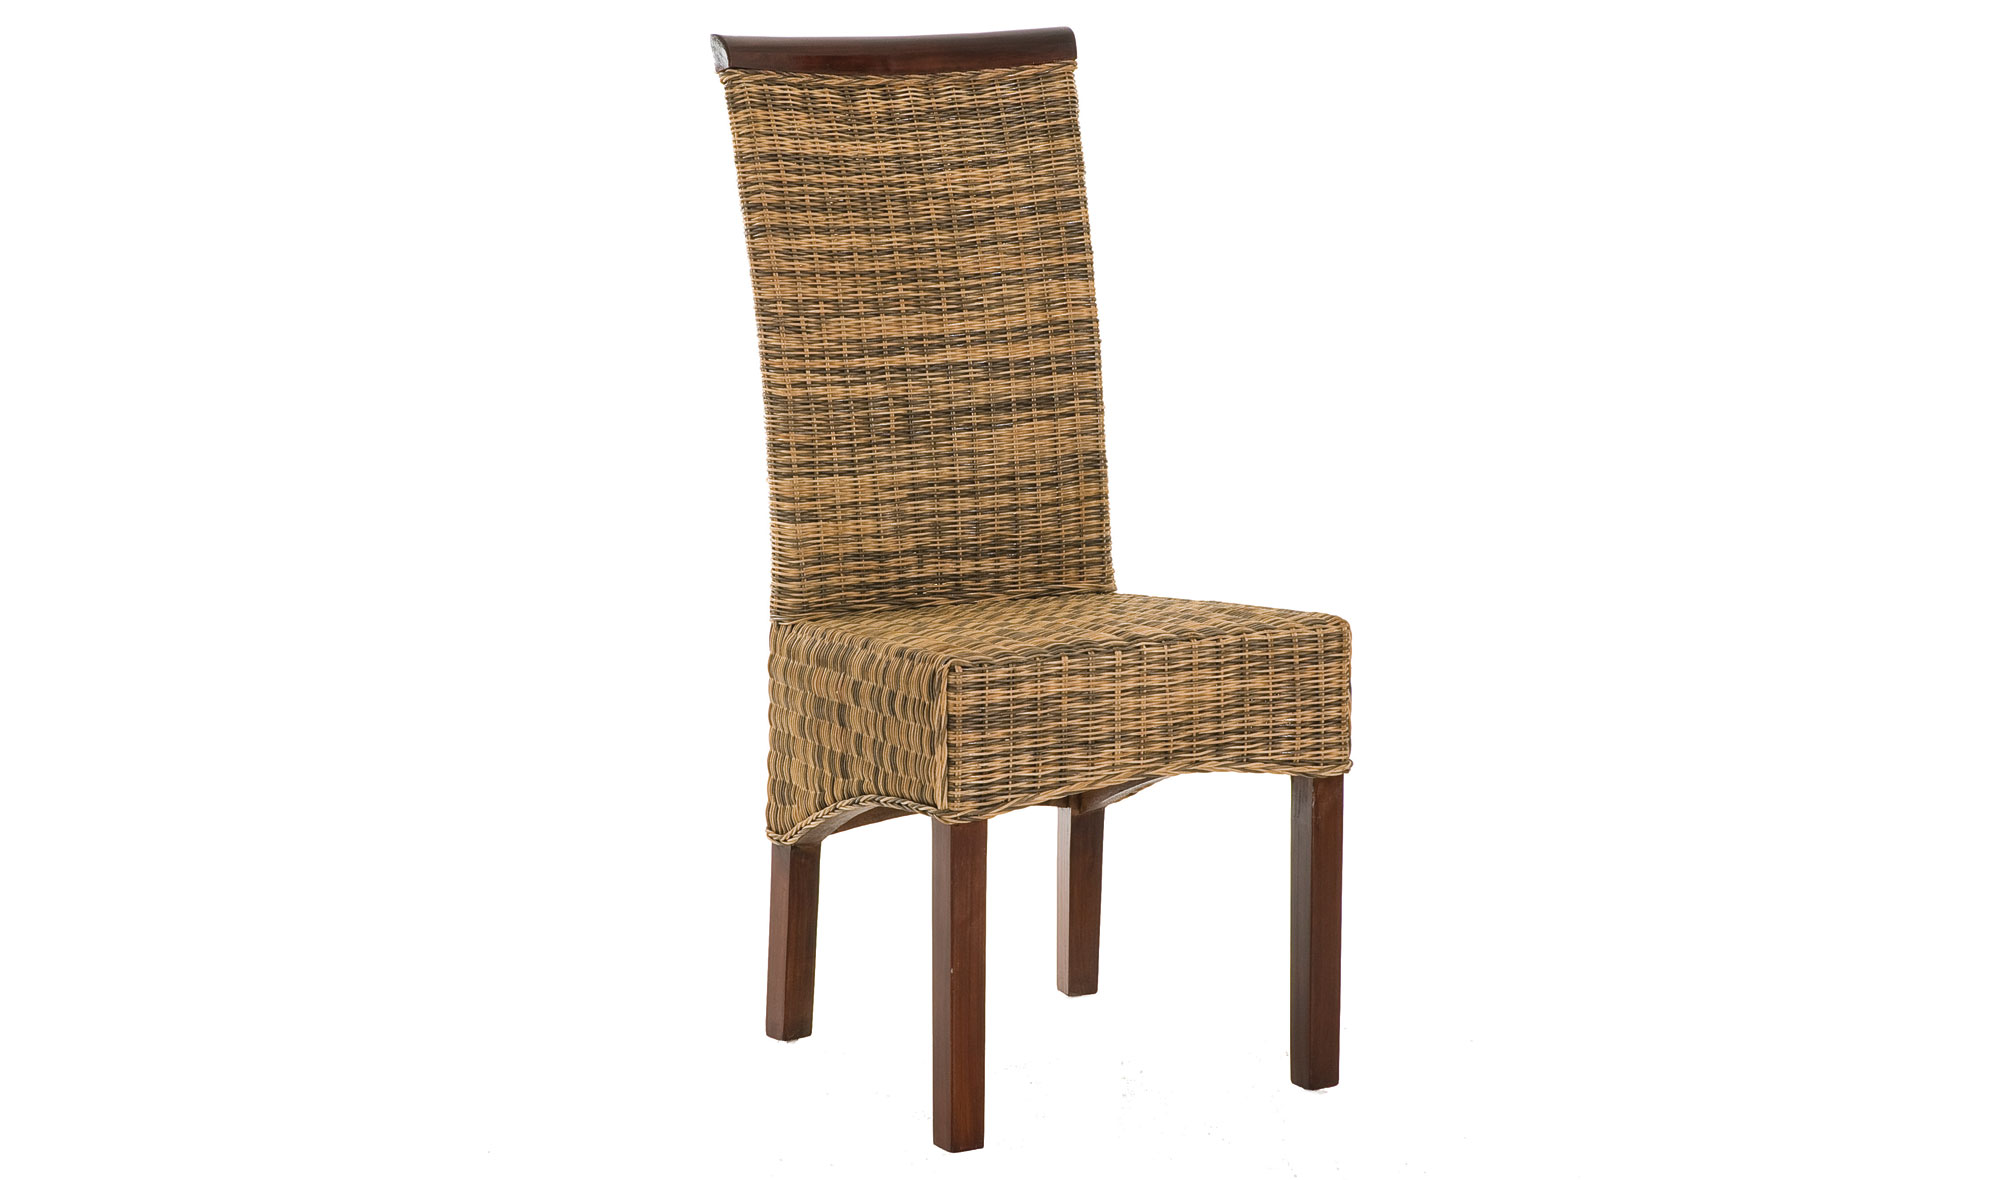 Muebles Hoja De Platano - Silla Hoja De Platano Colonial Sipura No Disponible En [mjhdah]https://cdn.laprensa.com.ni/wp-content/uploads/2011/04/1303176648_160411-muebles.jpg